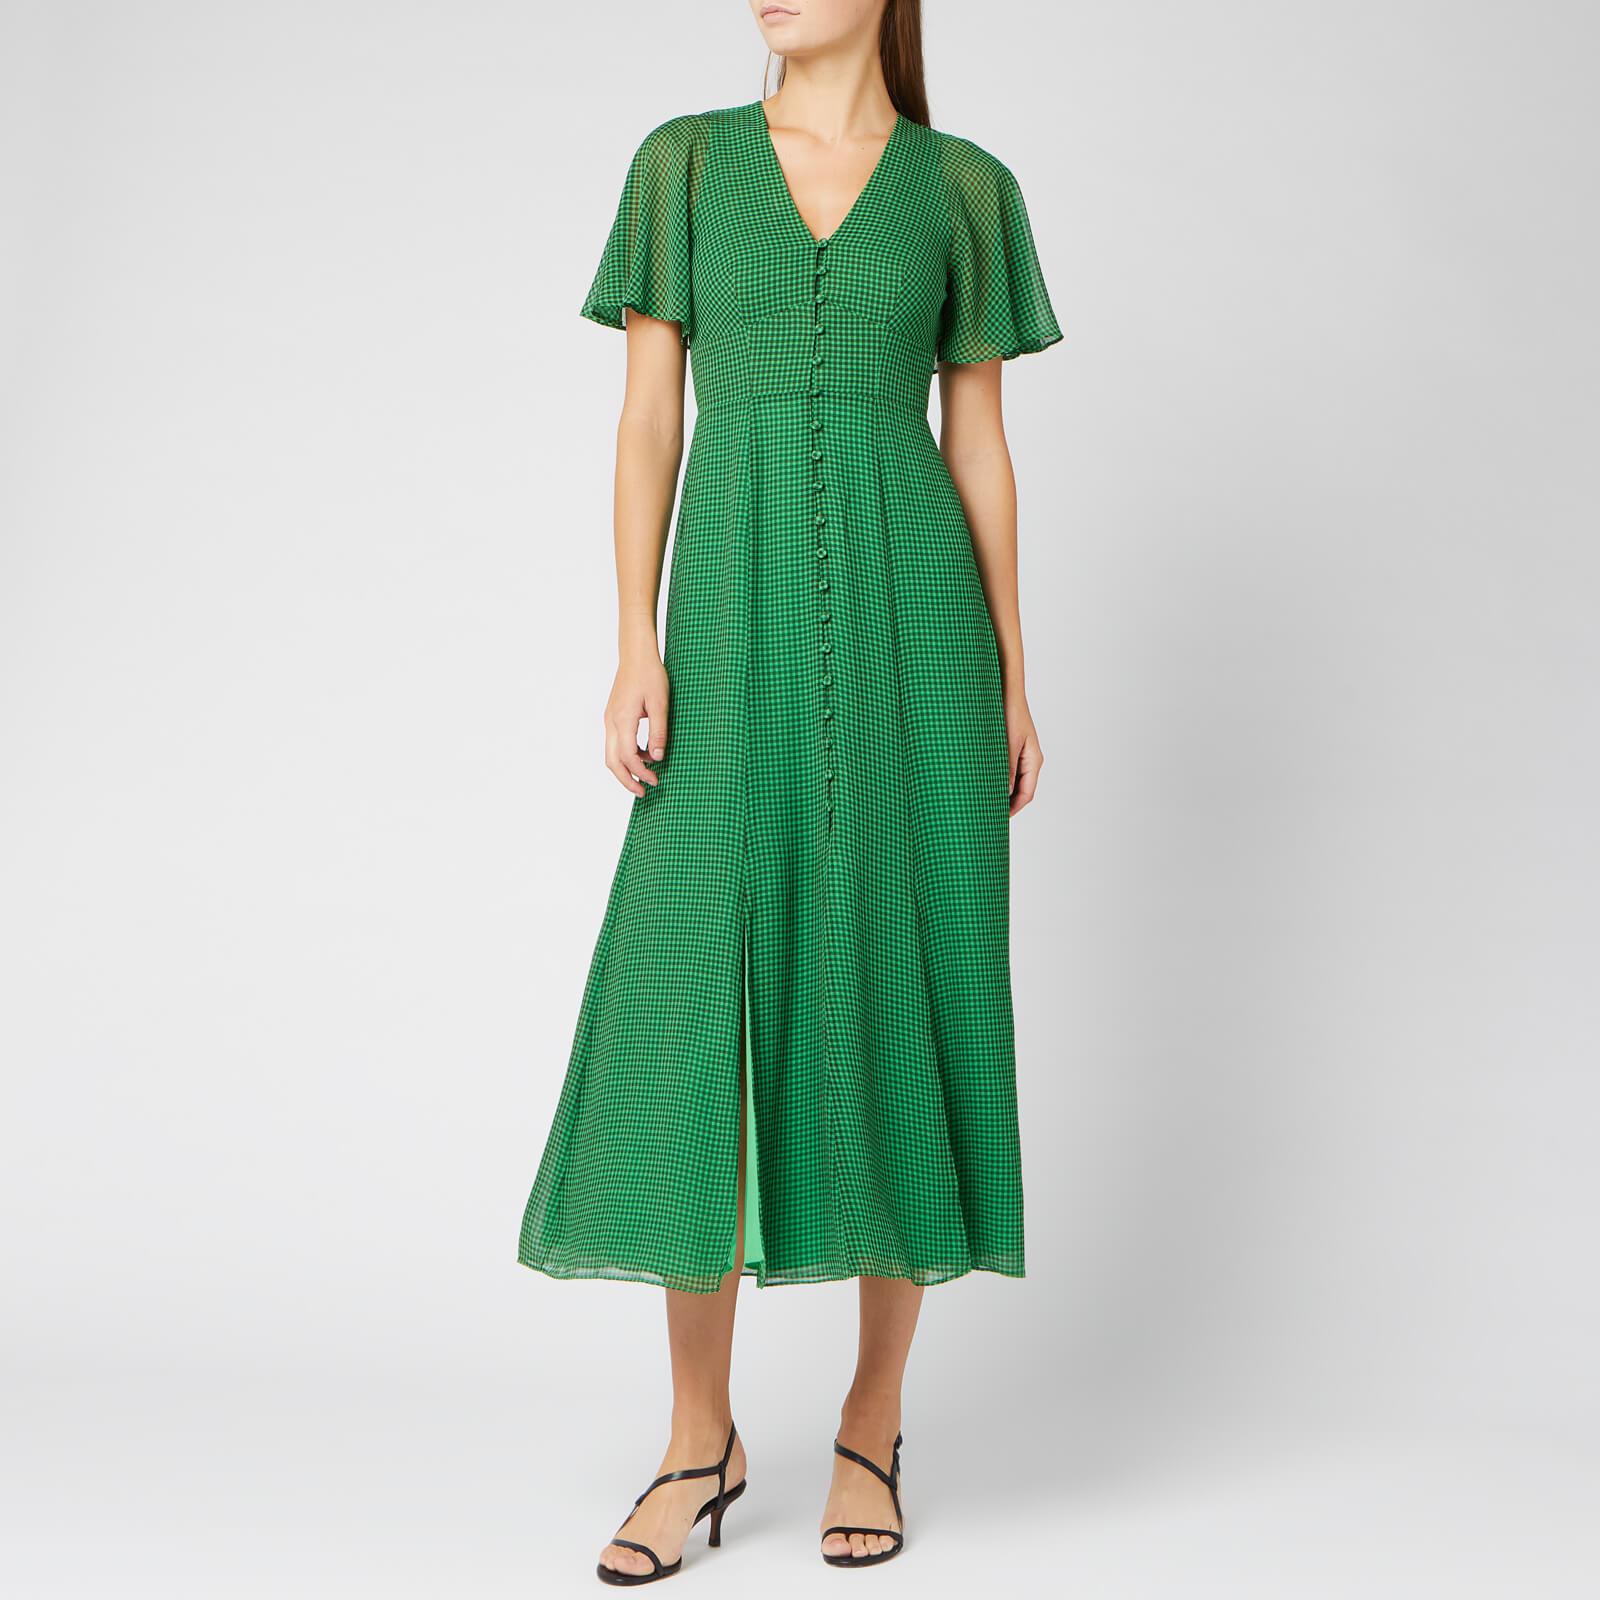 Whistles Women's Cecily Check Dress - Green/Multi - UK 12 - Green